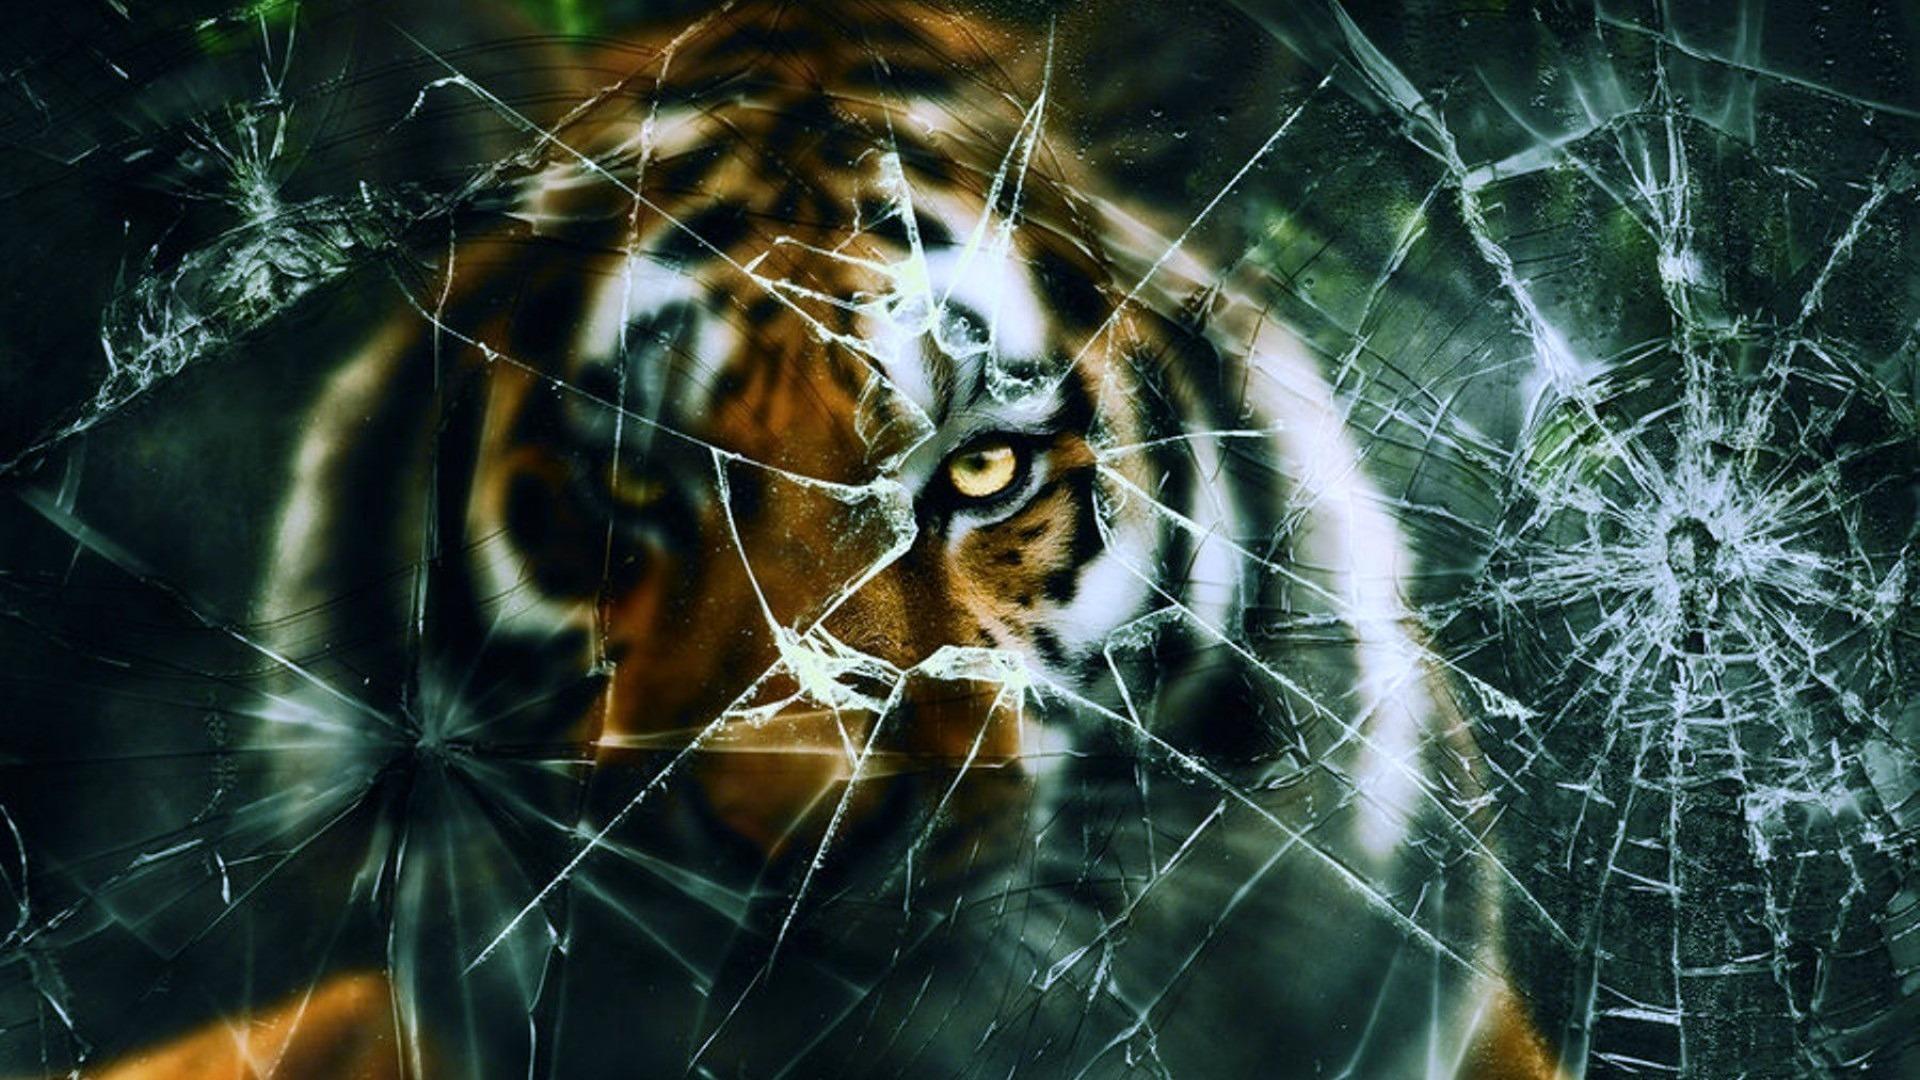 Get Live Wallpaper For Iphone Tiger Broken Screen Wallpaper 2018 Wallpapers Hd